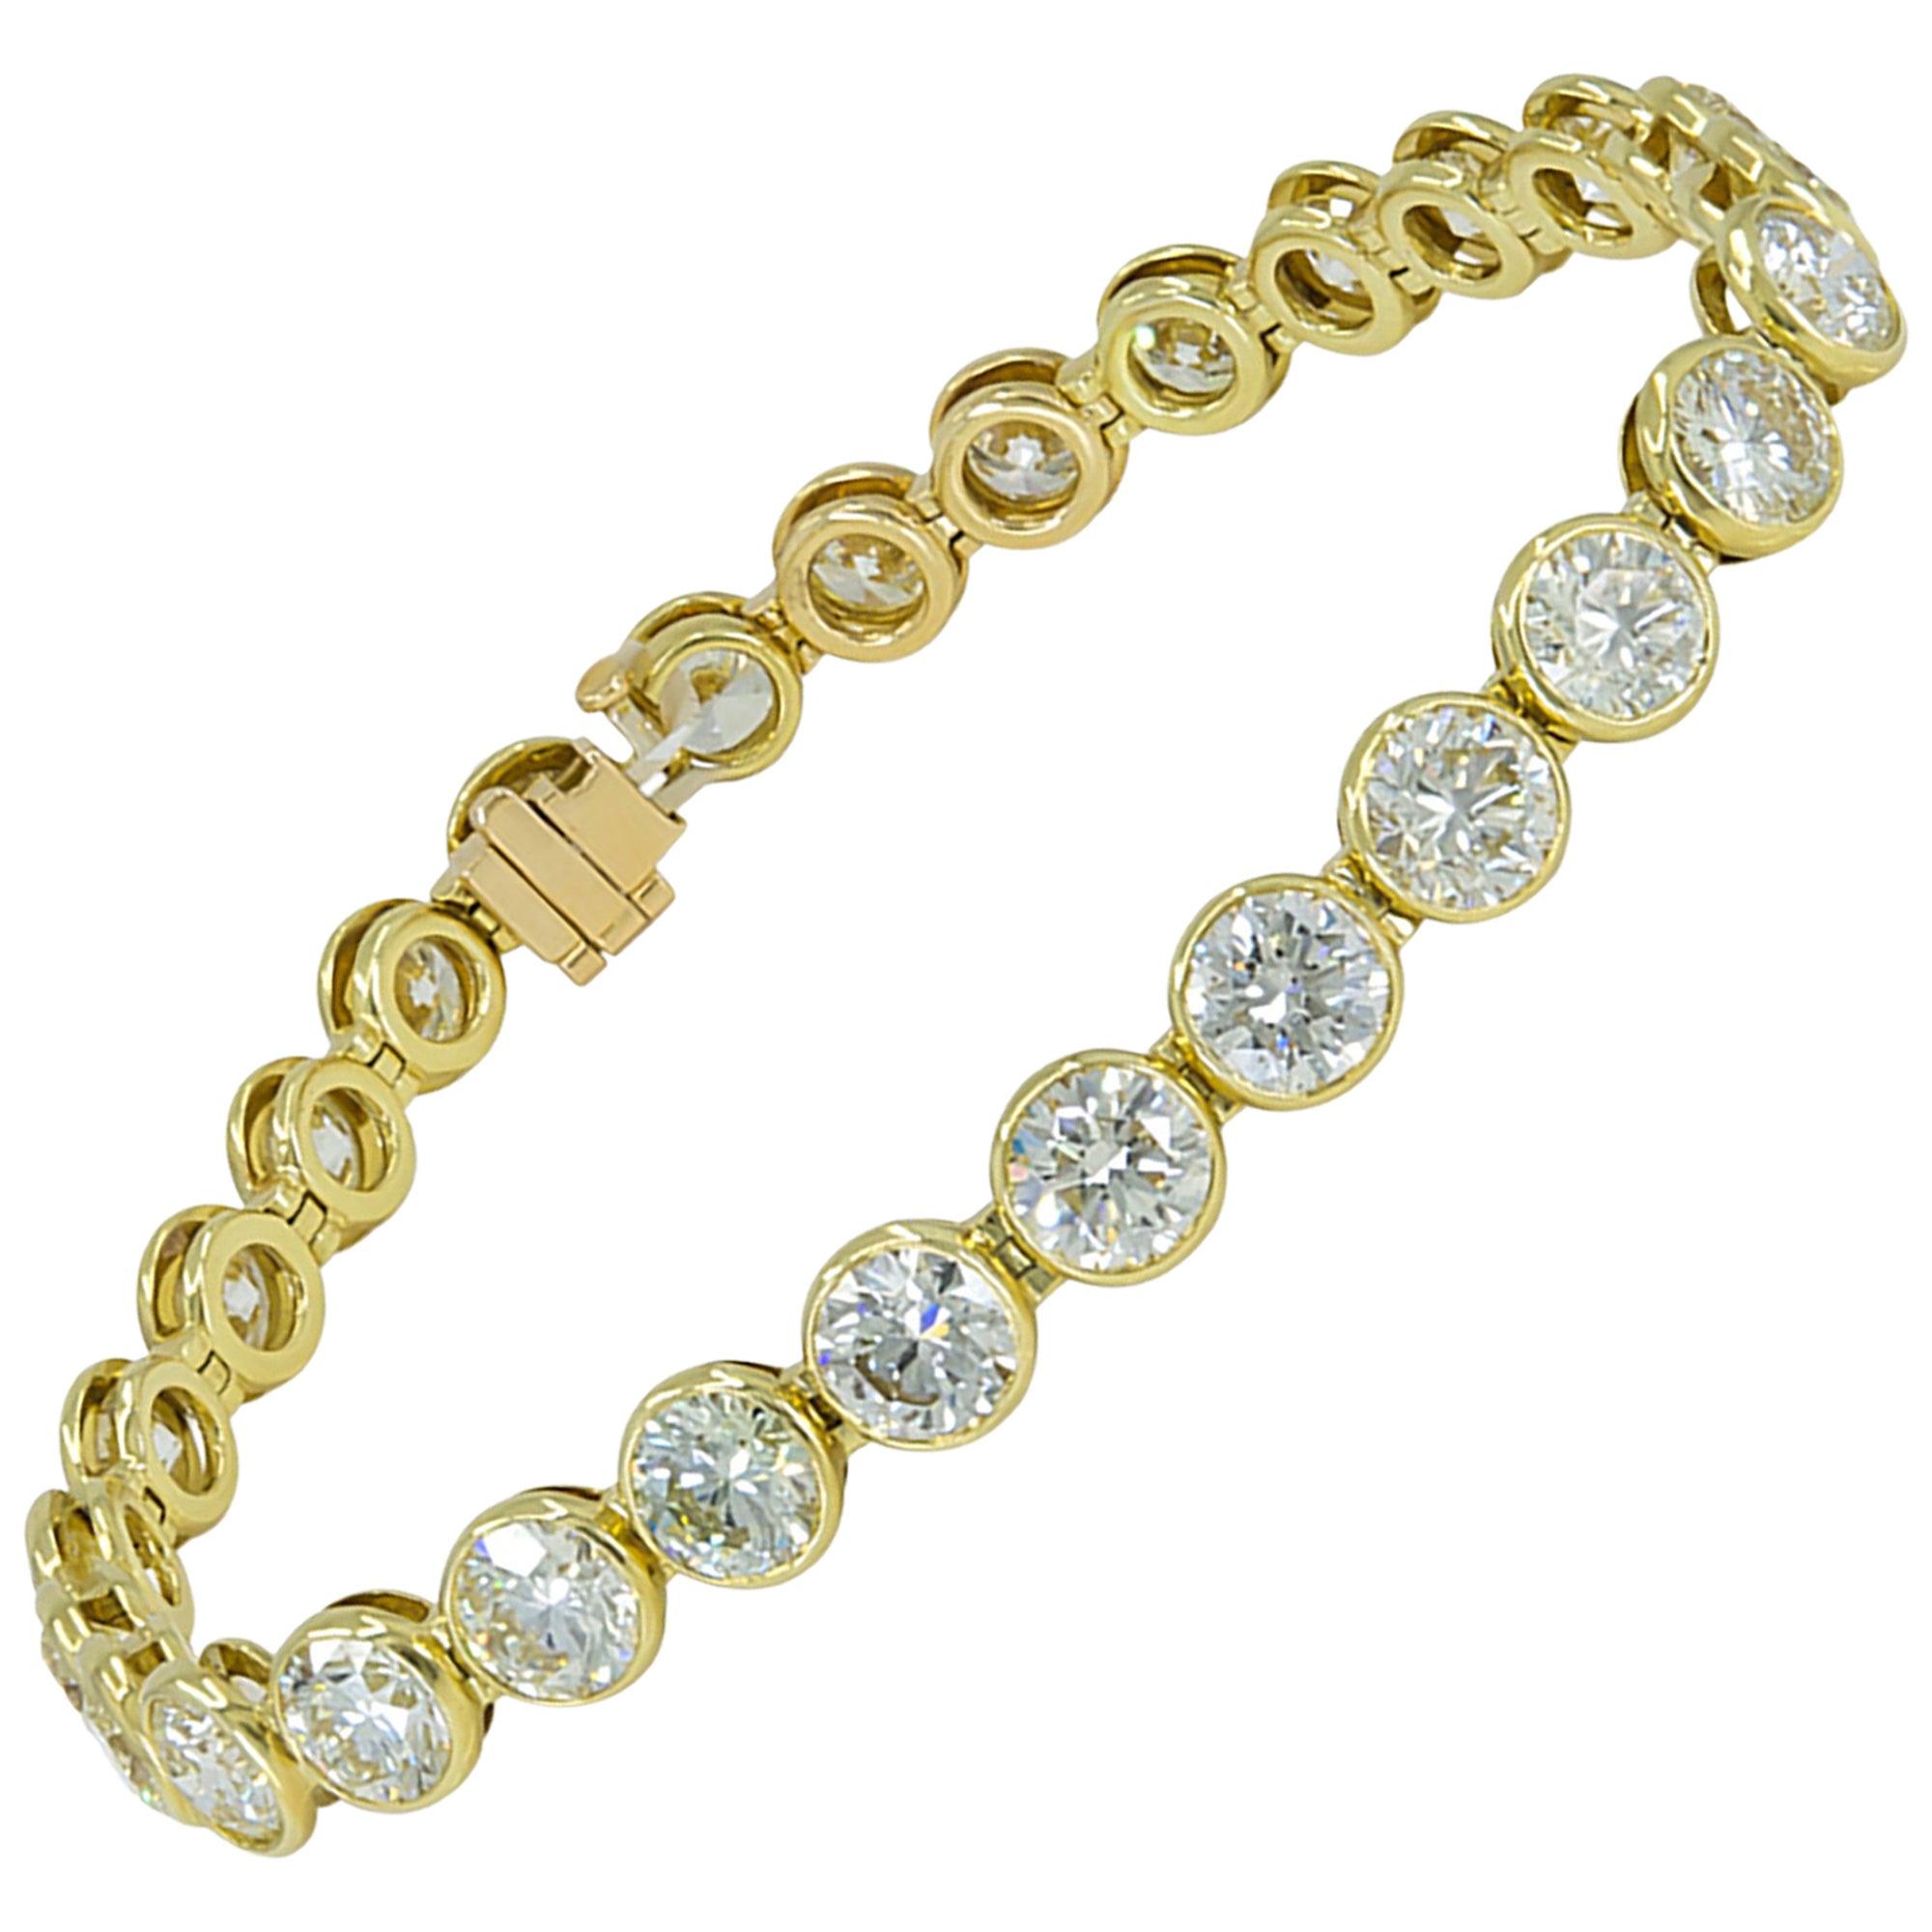 15.10 Carat Diamond 18 Karat Yellow Gold Tennis Bracelet